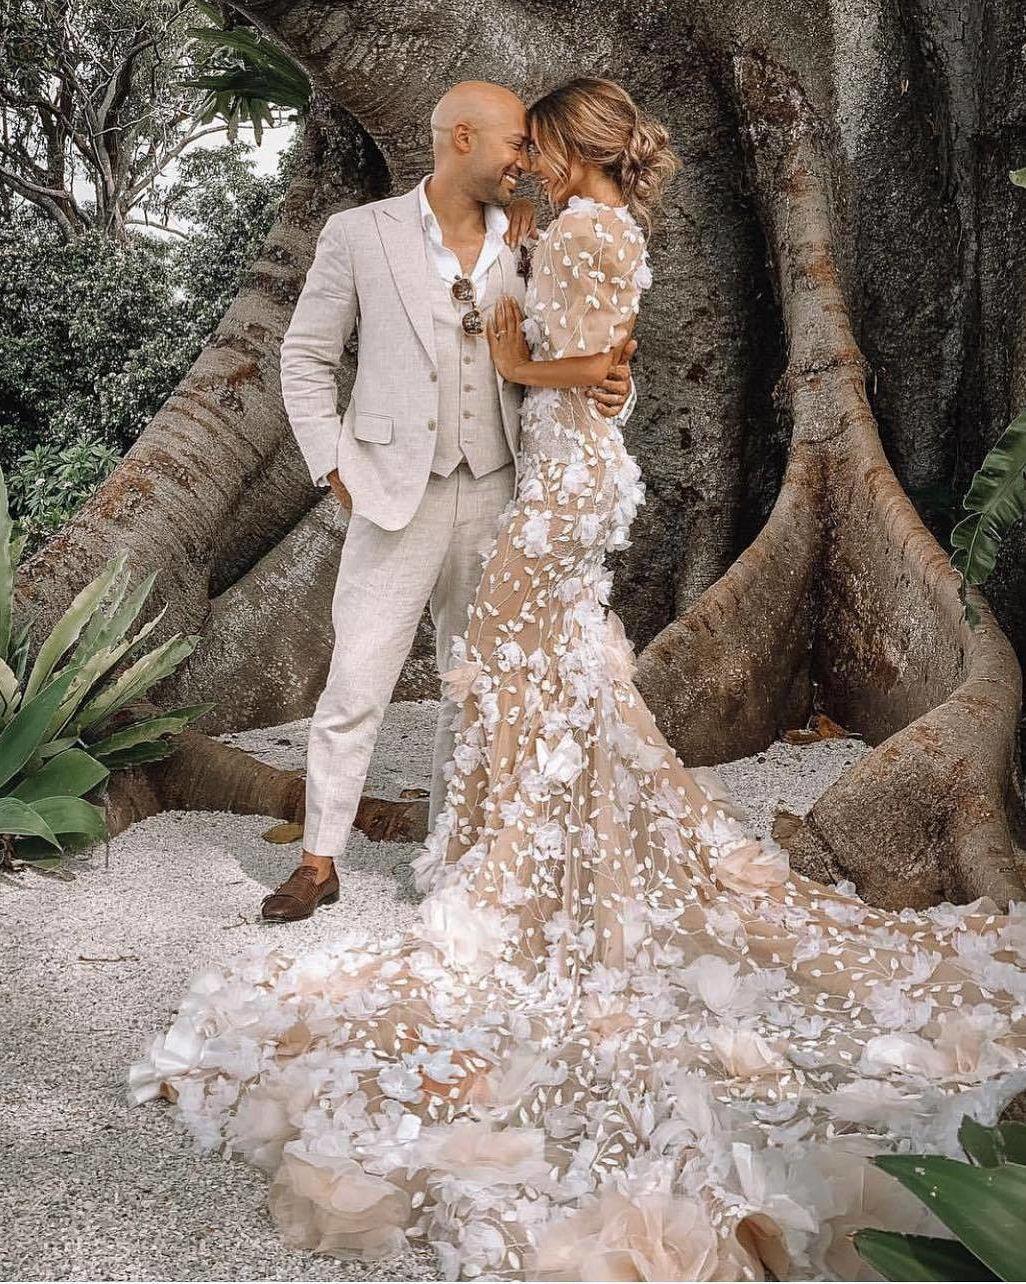 Custom Wedding Dresses And Bespoke Bridal Attire Dream Wedding Dresses Wedding Dresses Vintage Wedding Dresses Simple [ 1284 x 1026 Pixel ]